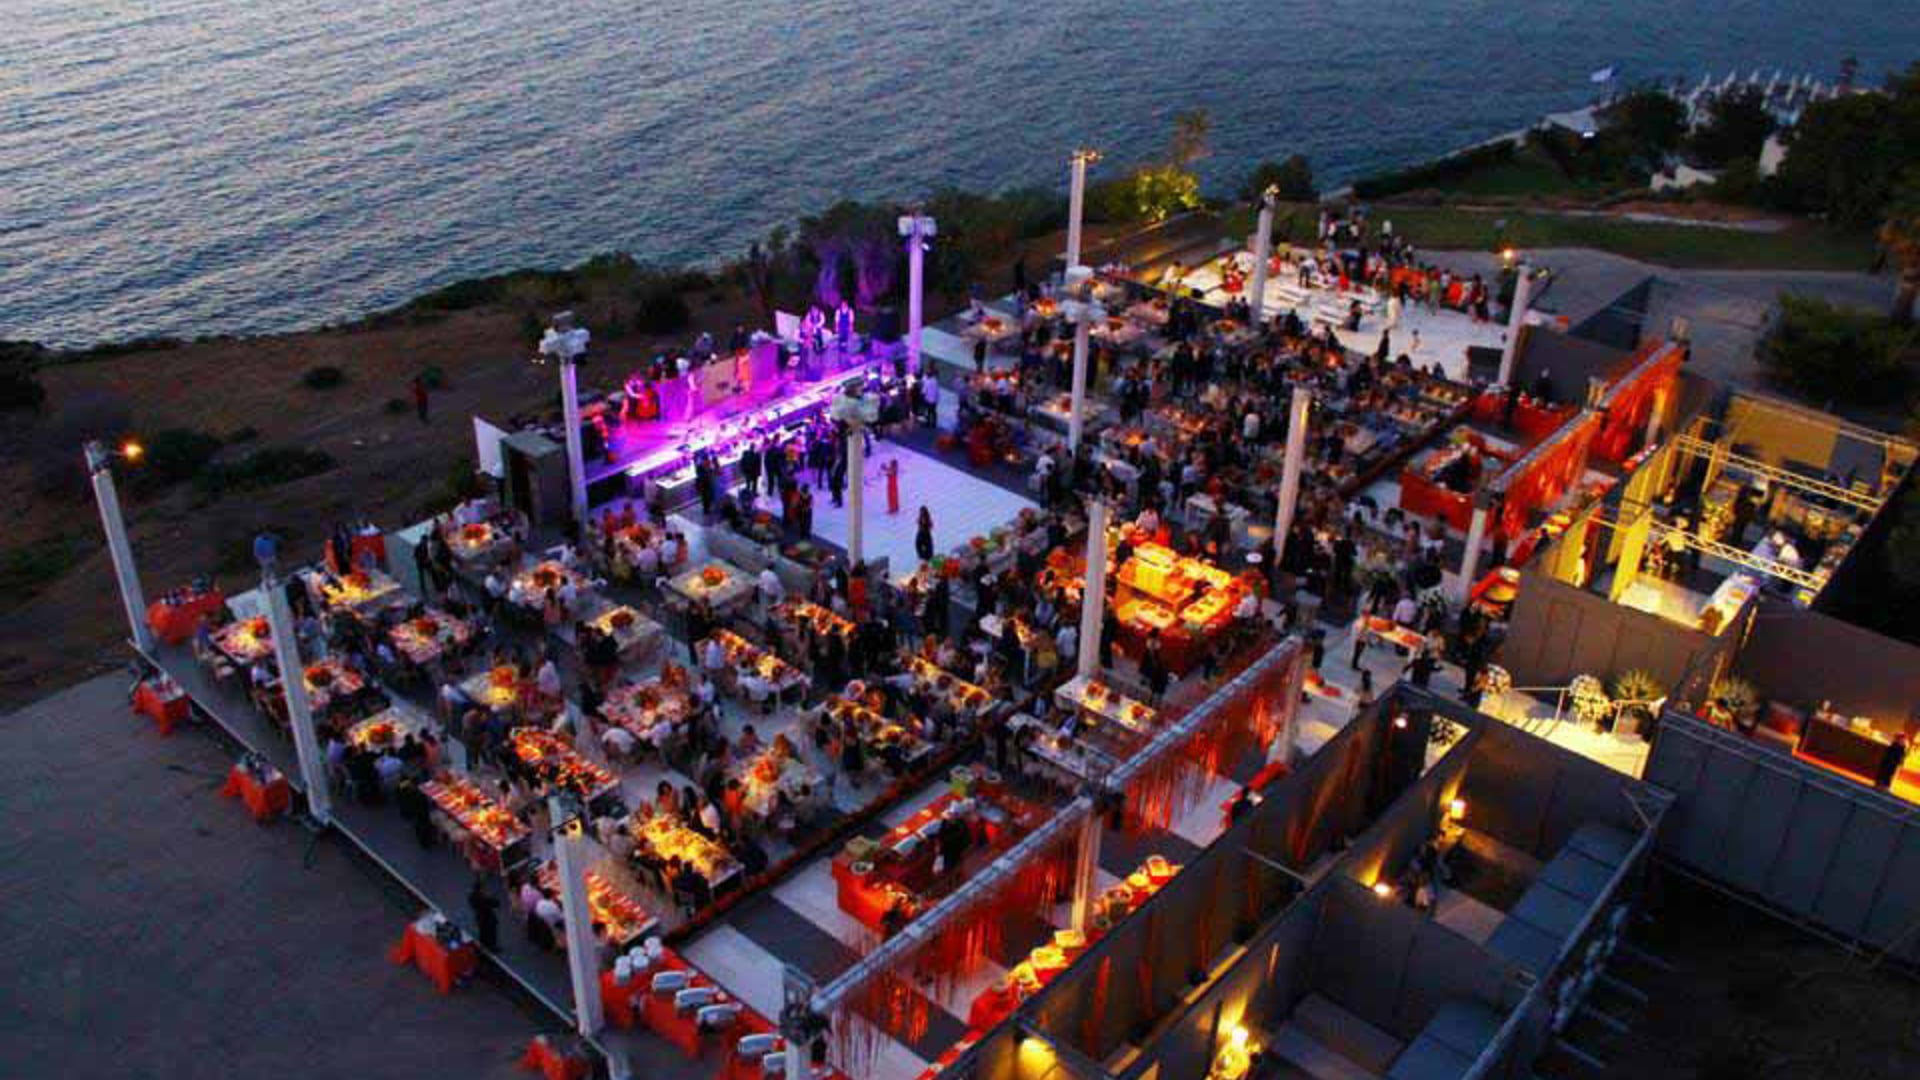 Summer weddind party  @ Four Seasons Astir Palace Hotel